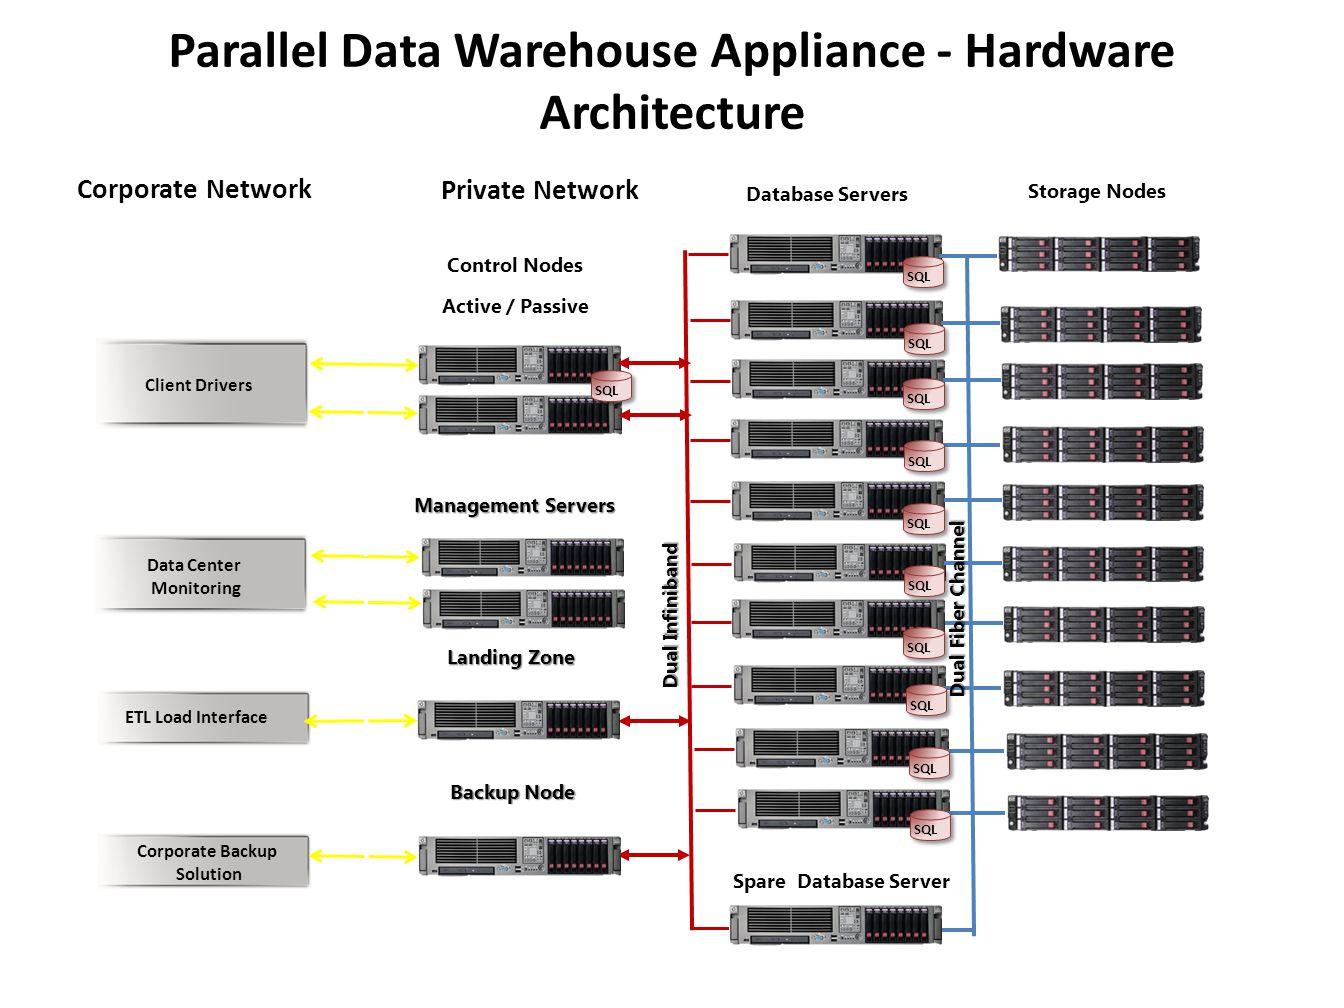 Parallel Data Warehouse Appliance - Hardware Architecture Database Servers Dual Infiniband Control Nodes Active / Passive Landing Zone Backup Node Sto